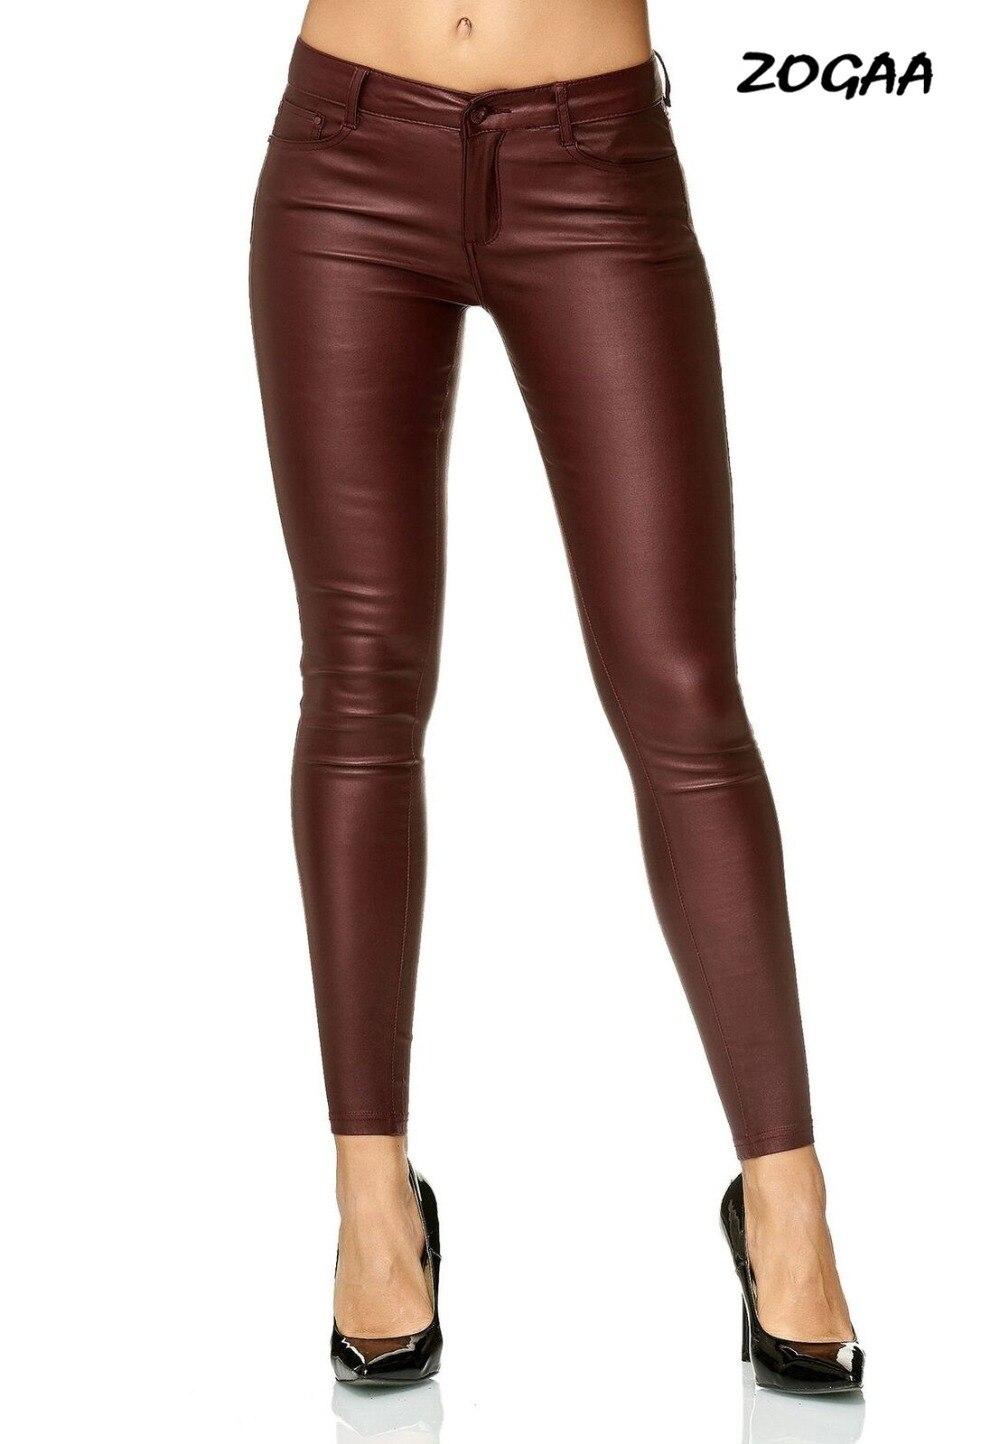 ZOGAA Ladies Leather Pants Motorcycle